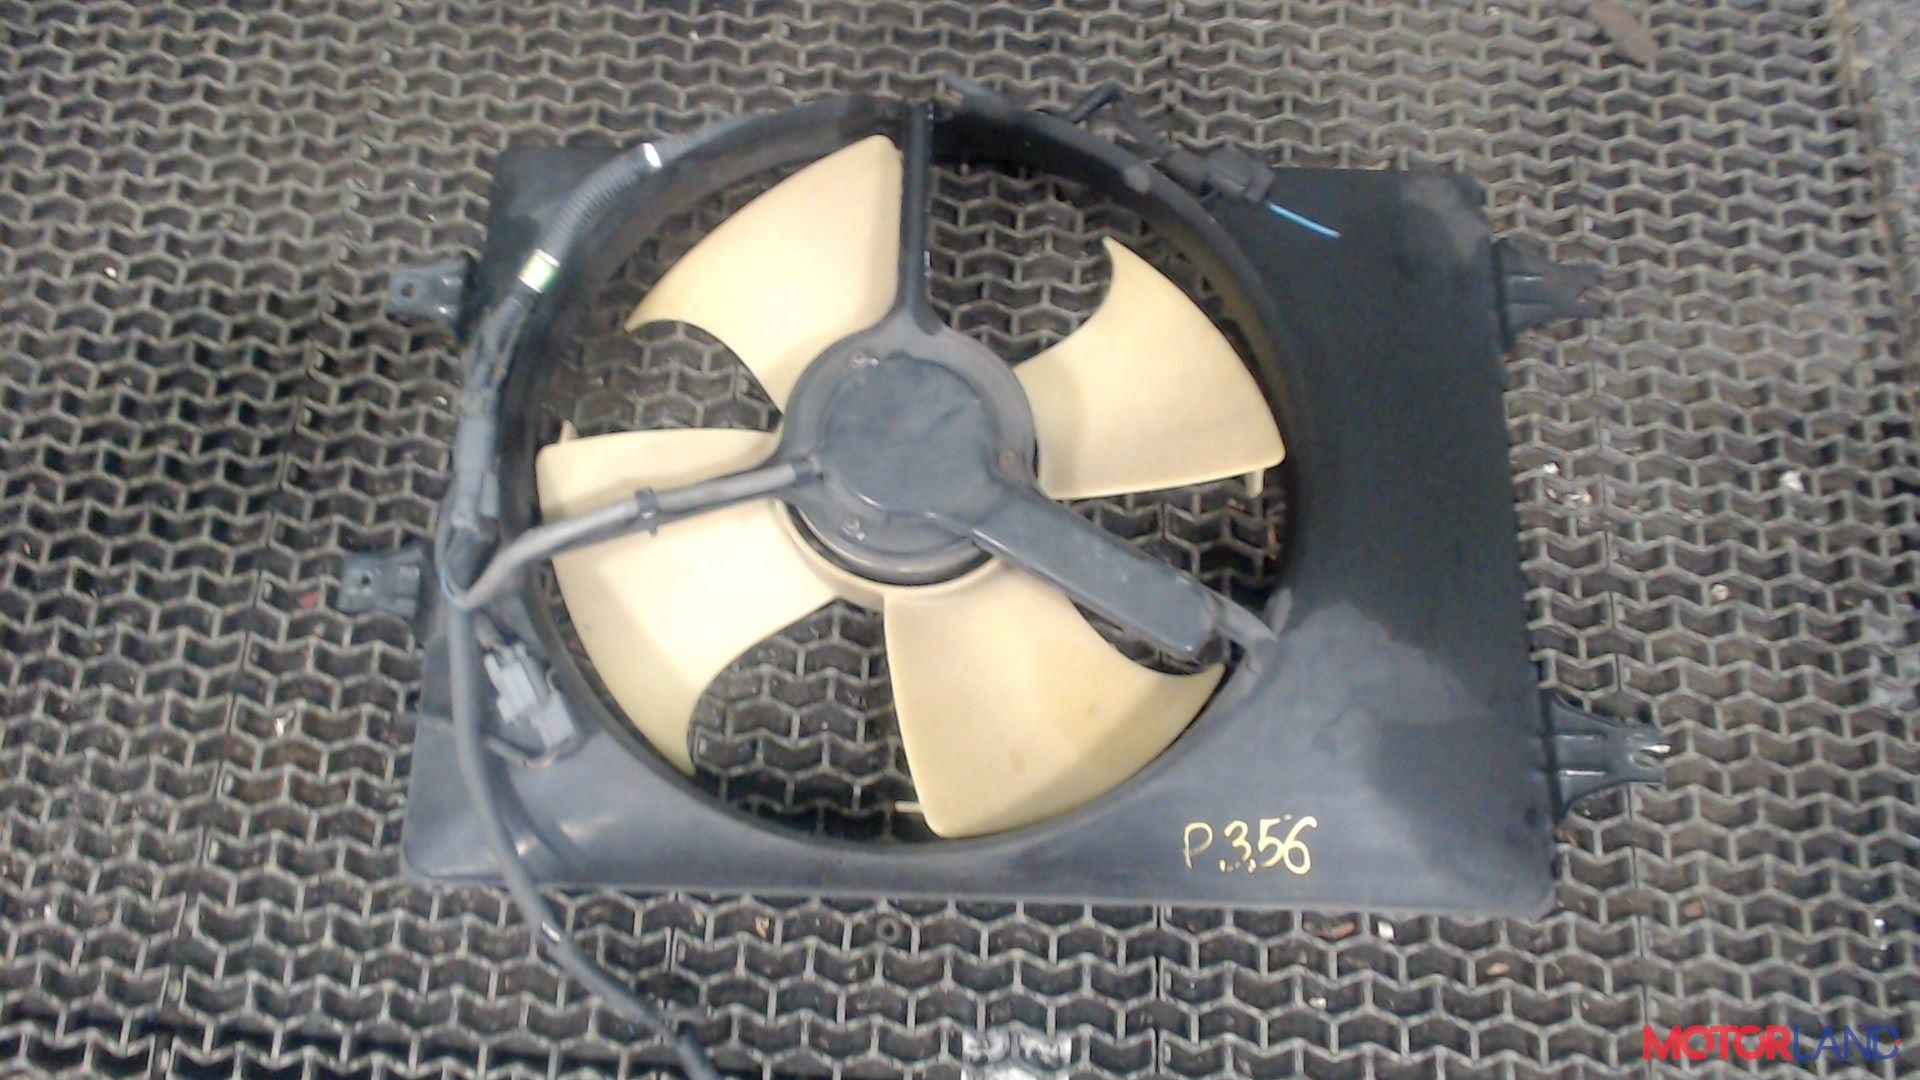 Вентилятор радиатора [AdditionalType] Acura MDX 2001-2006, [КонстрНомер-Артикул] #1